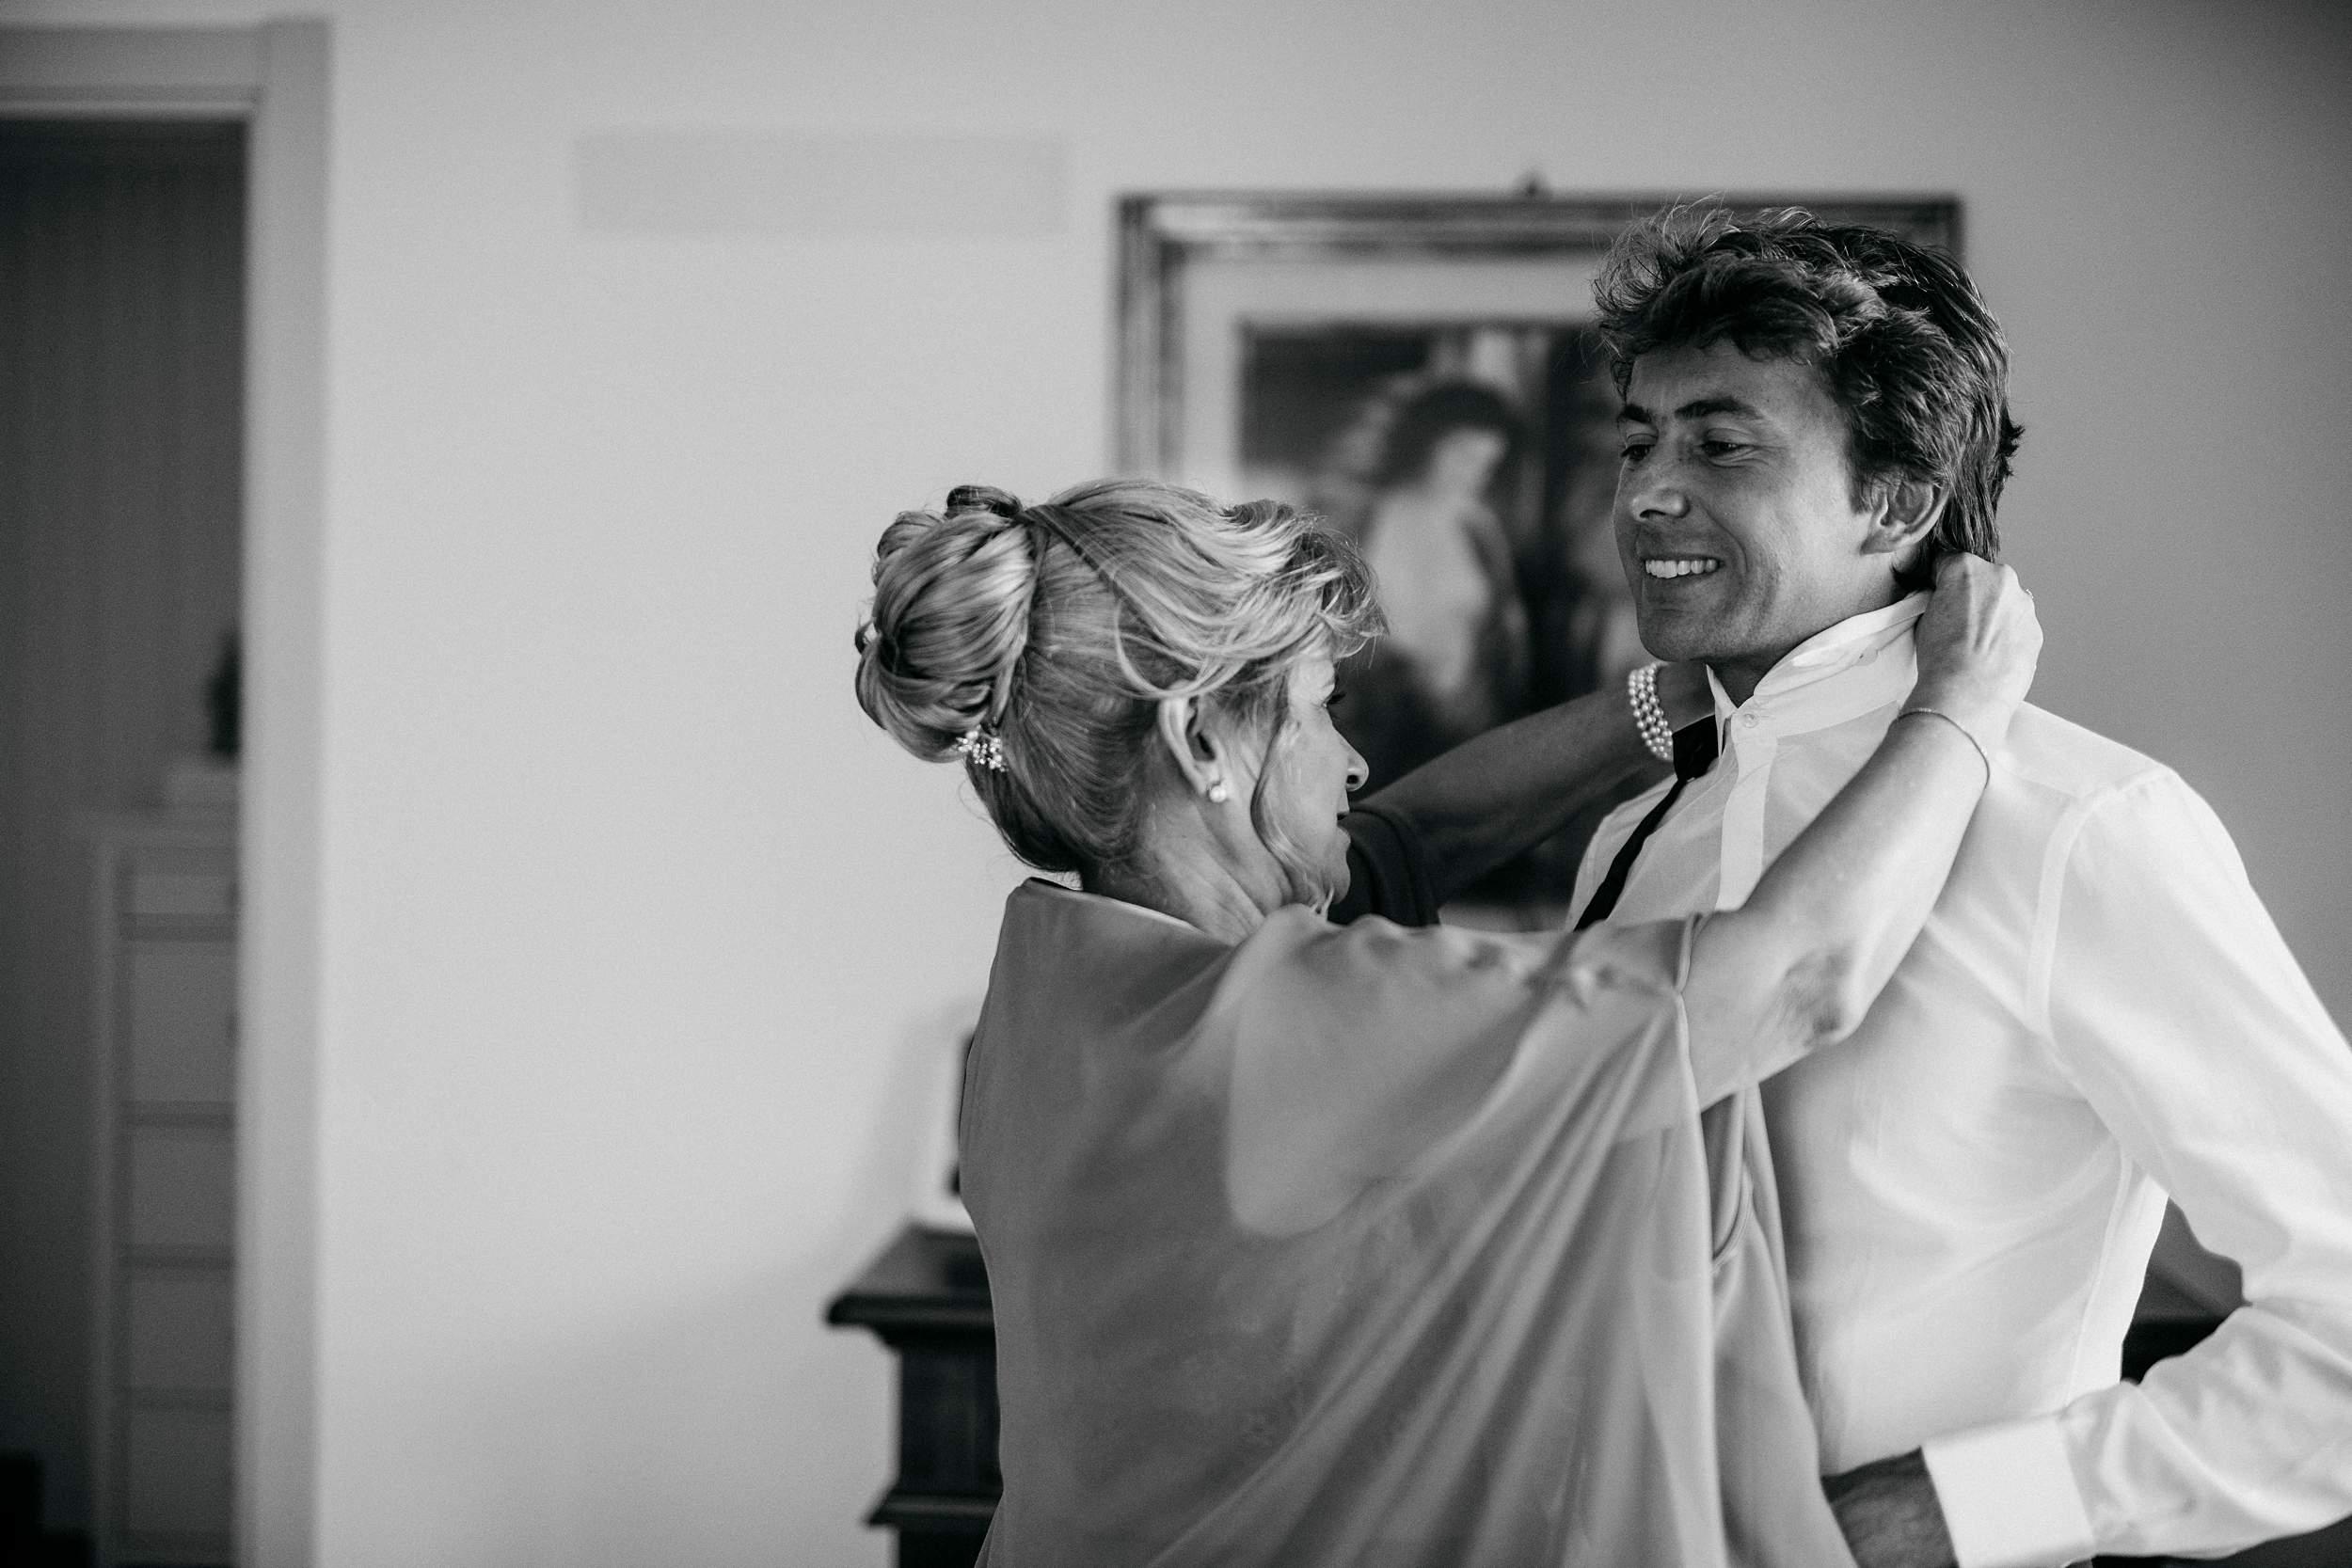 wedding in villa grabau lucca tuscany, matrimonio a villa grabau lucca toscana